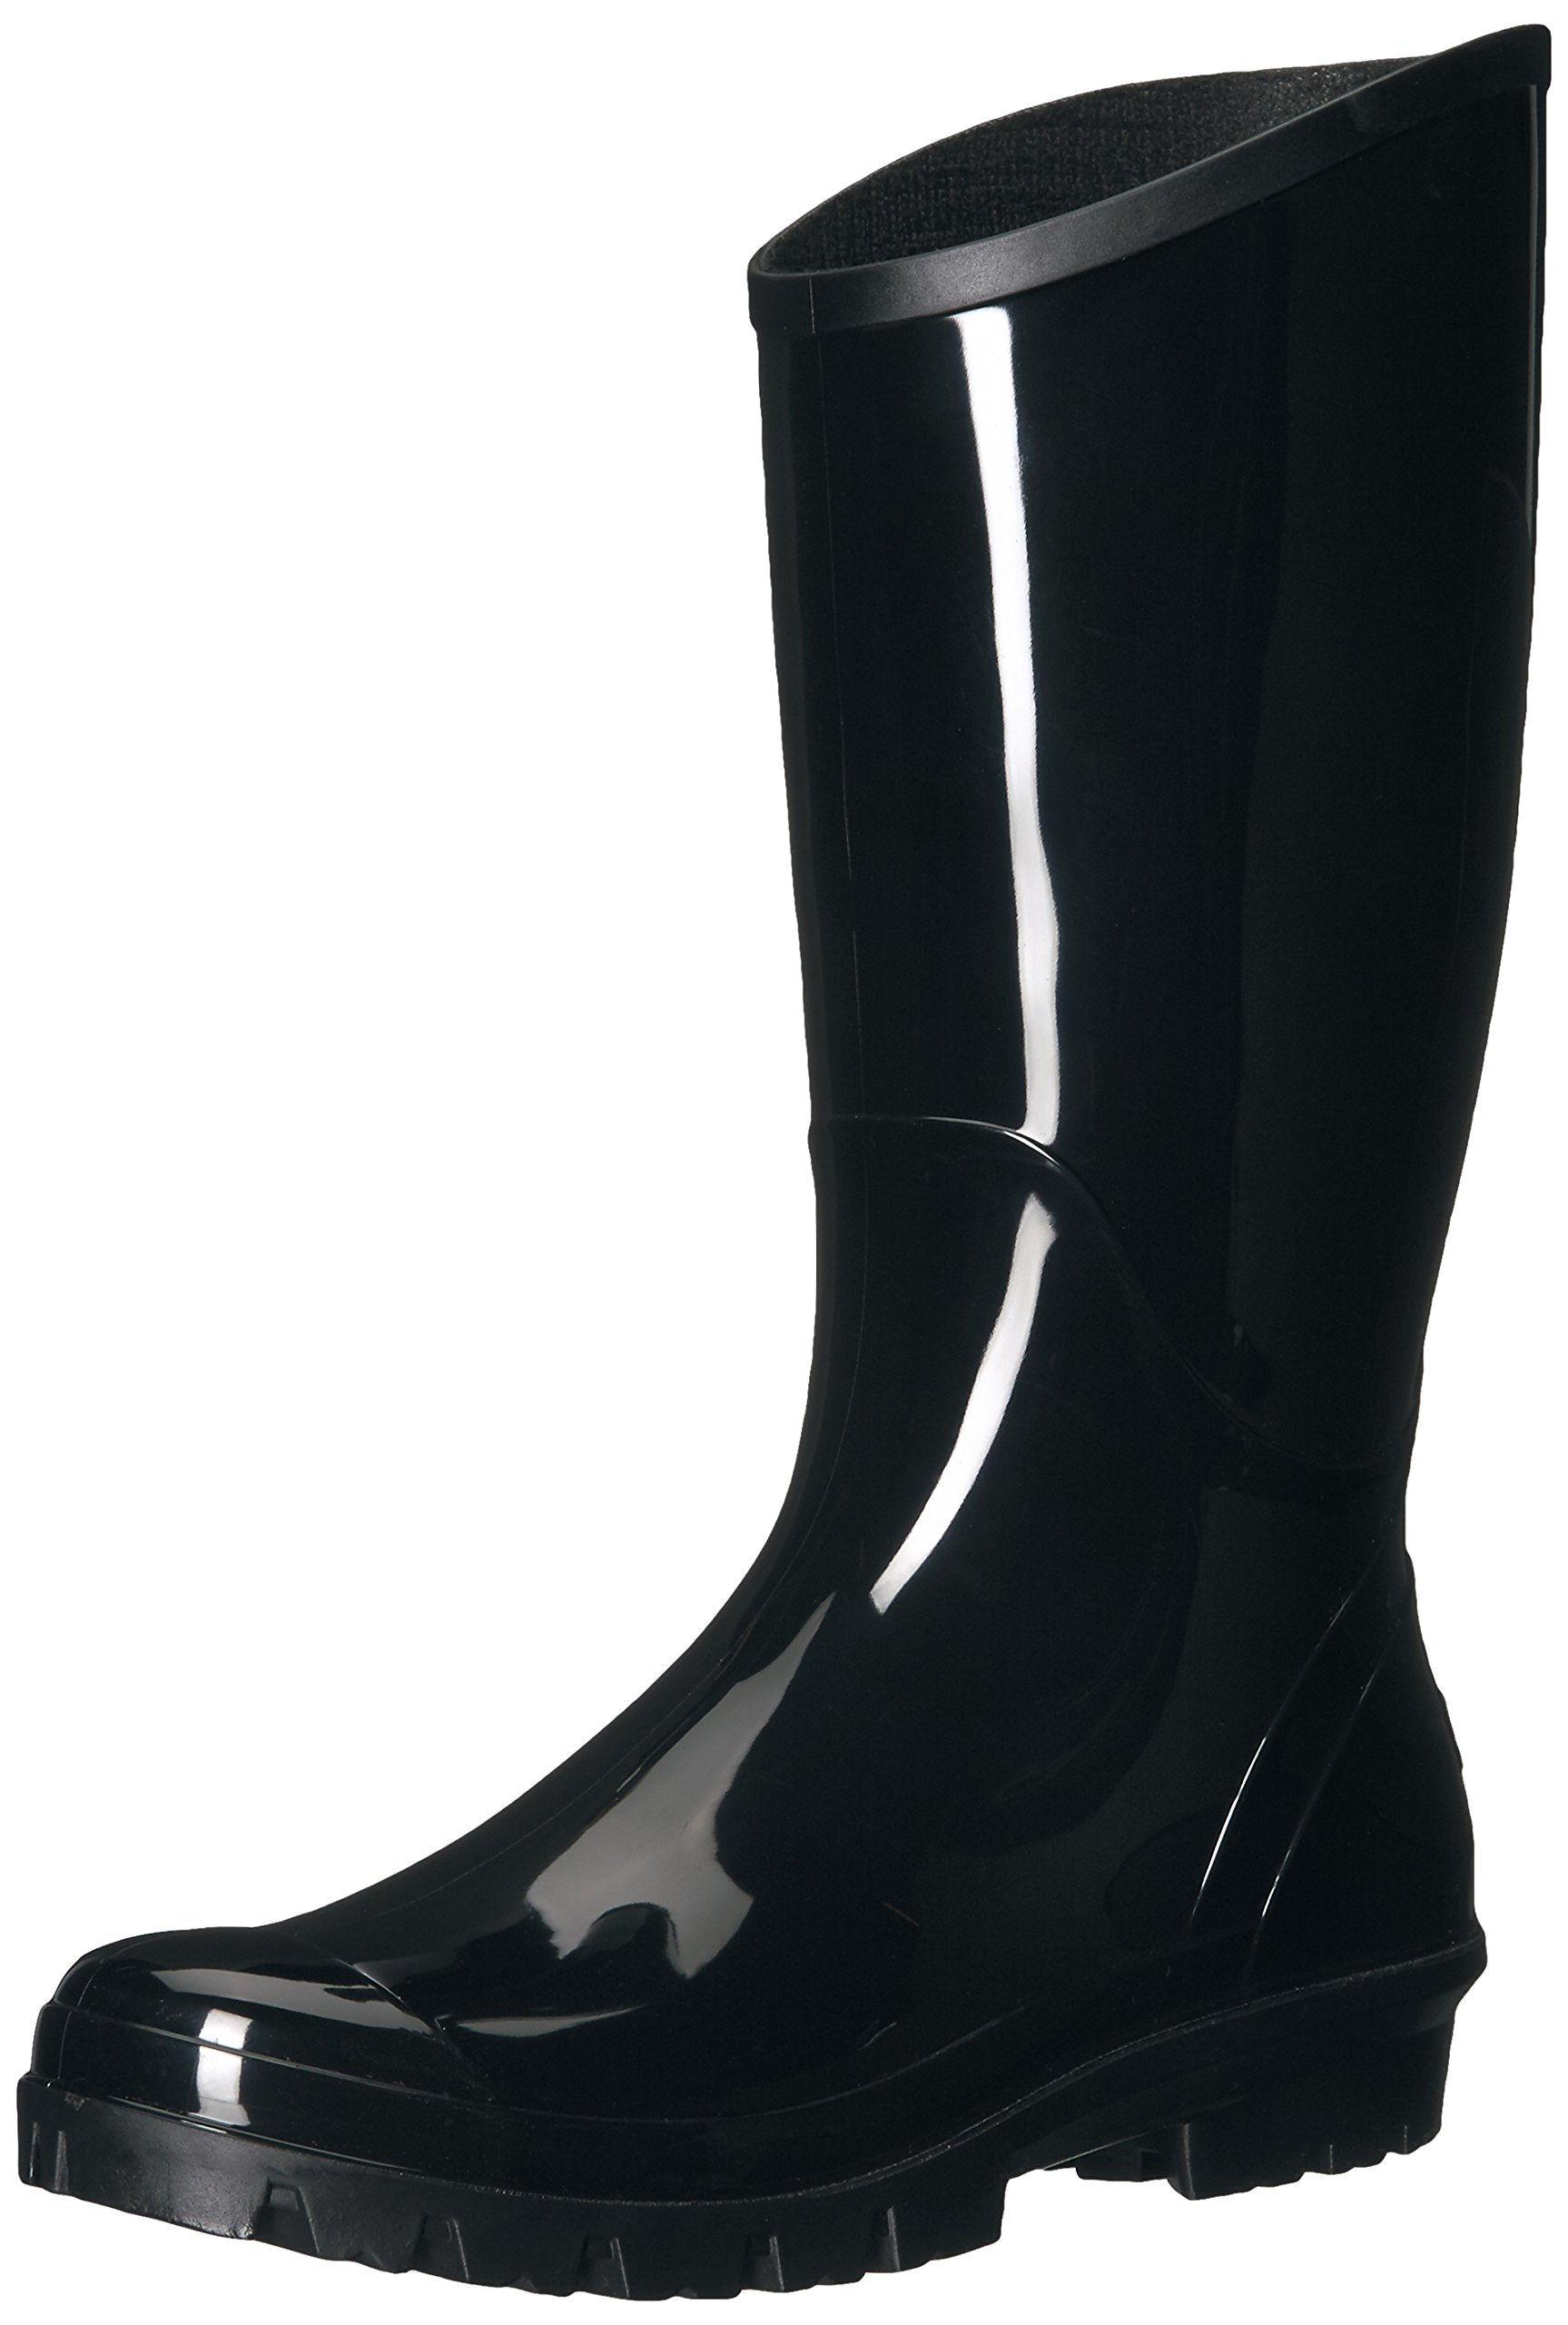 Columbia Women's Rainey Tall Rain Boot, Black, Monument, 8 B US